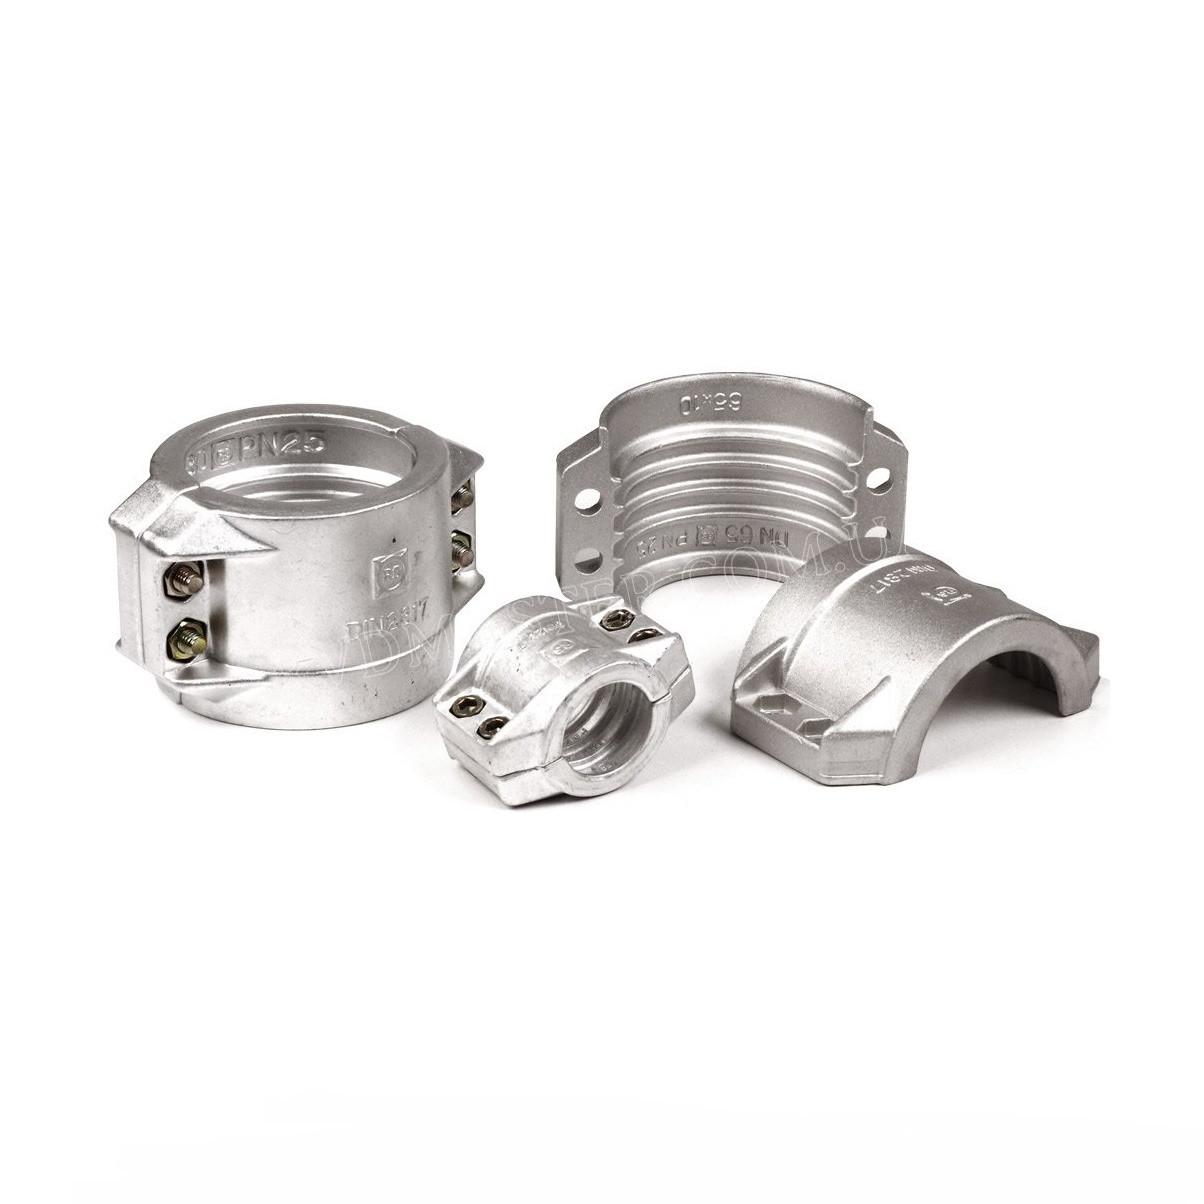 Обойма скорлупчатая, алюминиевая 118-122мм DIN 2817 (рукав 100х10)